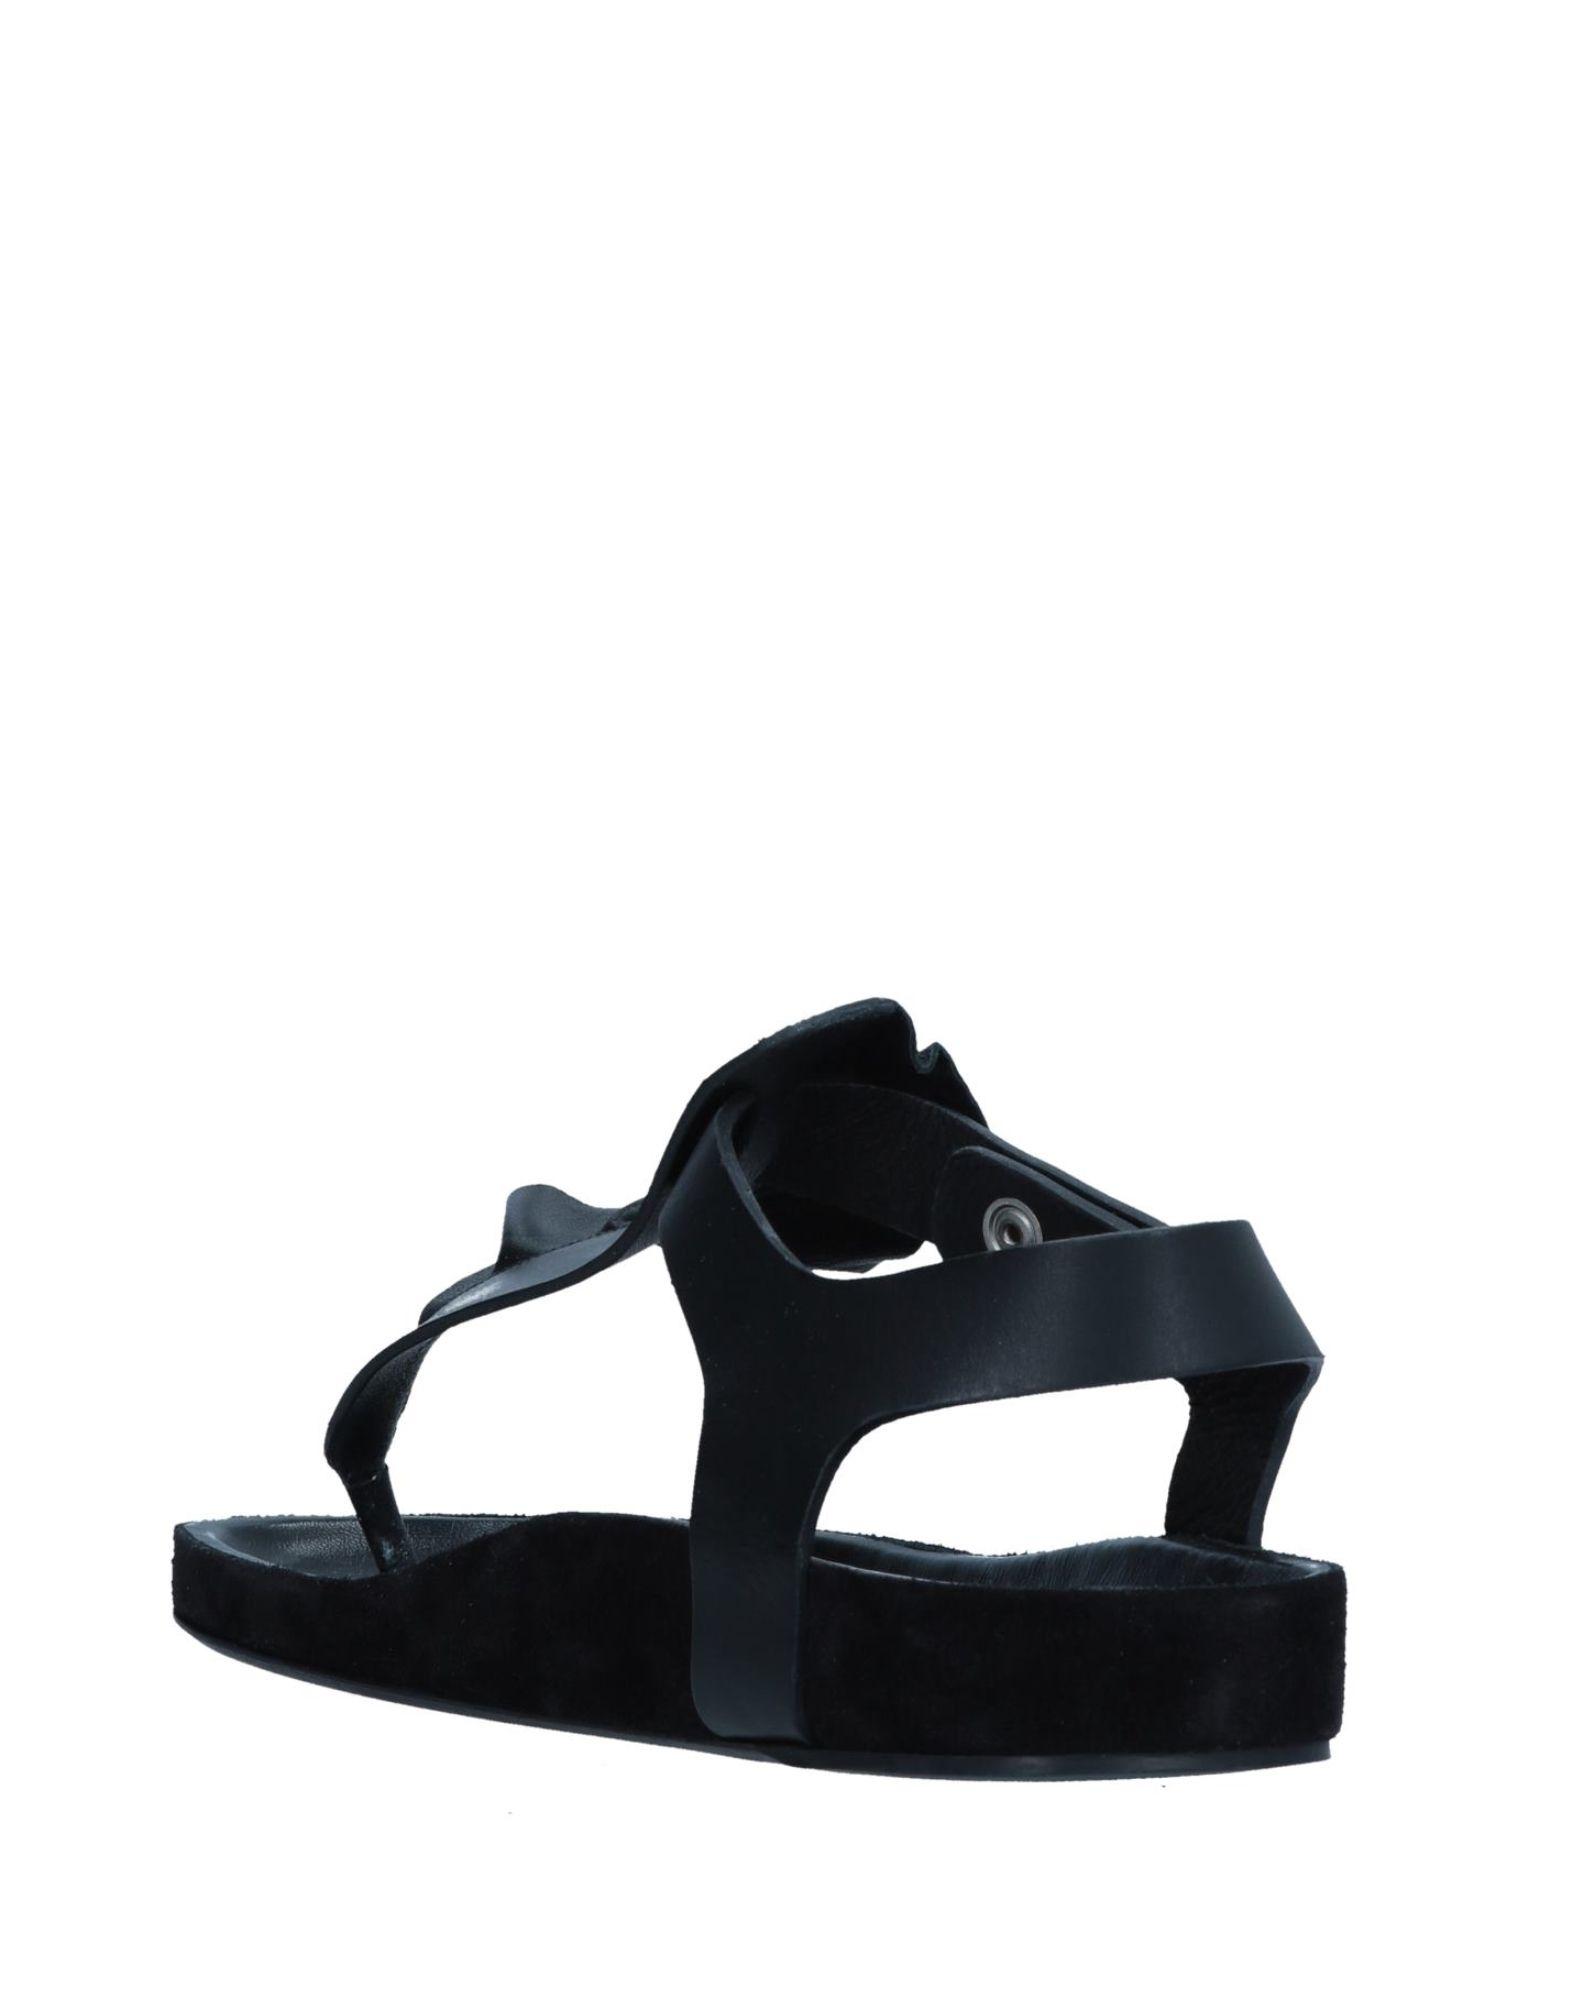 Isabel Marant Dianetten Damen Schuhe  11543759BRGut aussehende strapazierfähige Schuhe Damen a72fd1